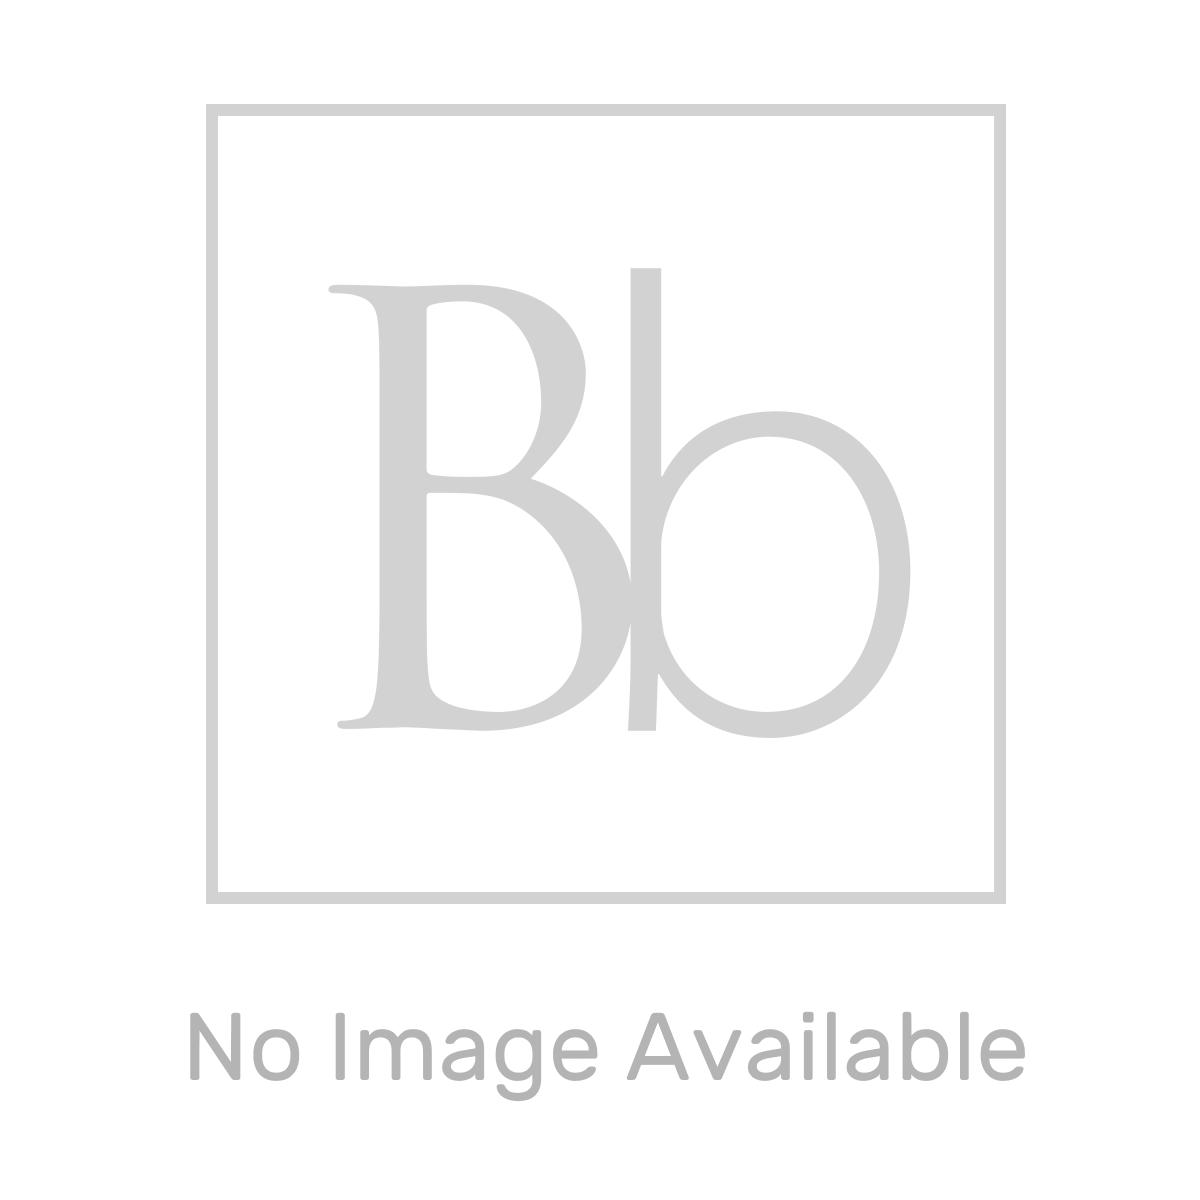 Sensio TrioTone Cube Clear Glass